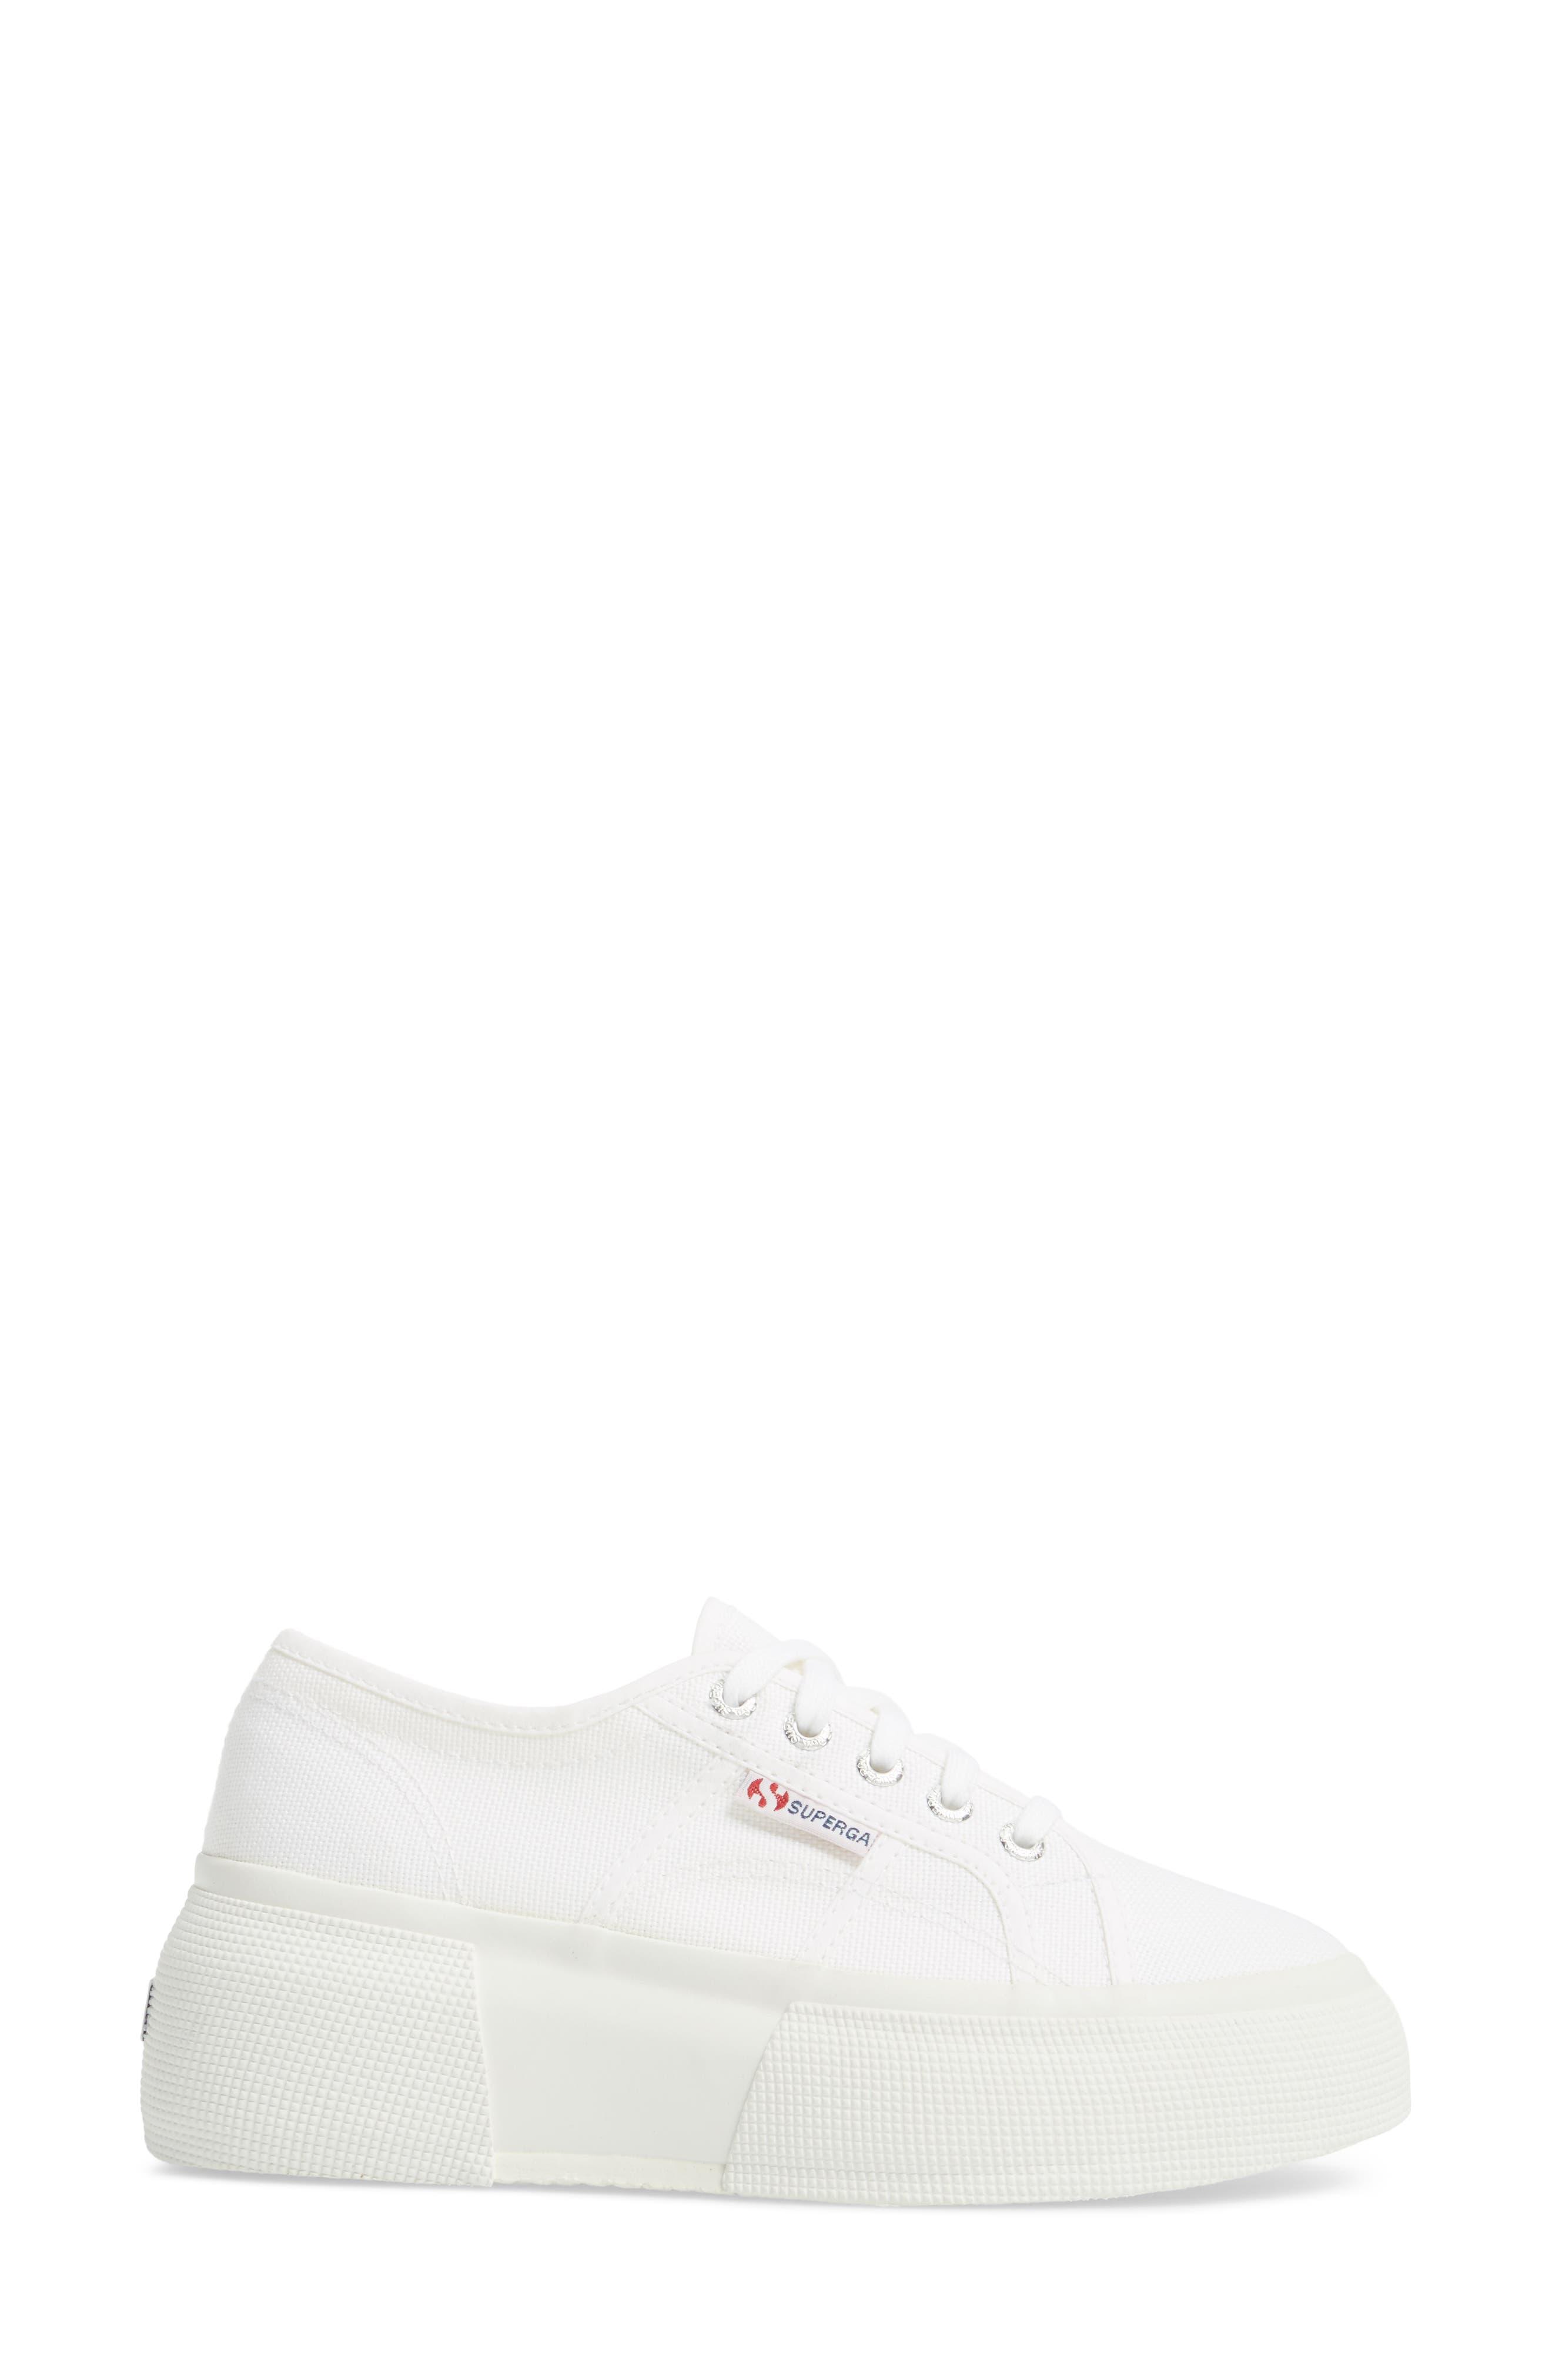 2287 Cotu Platform Sneaker,                             Alternate thumbnail 5, color,